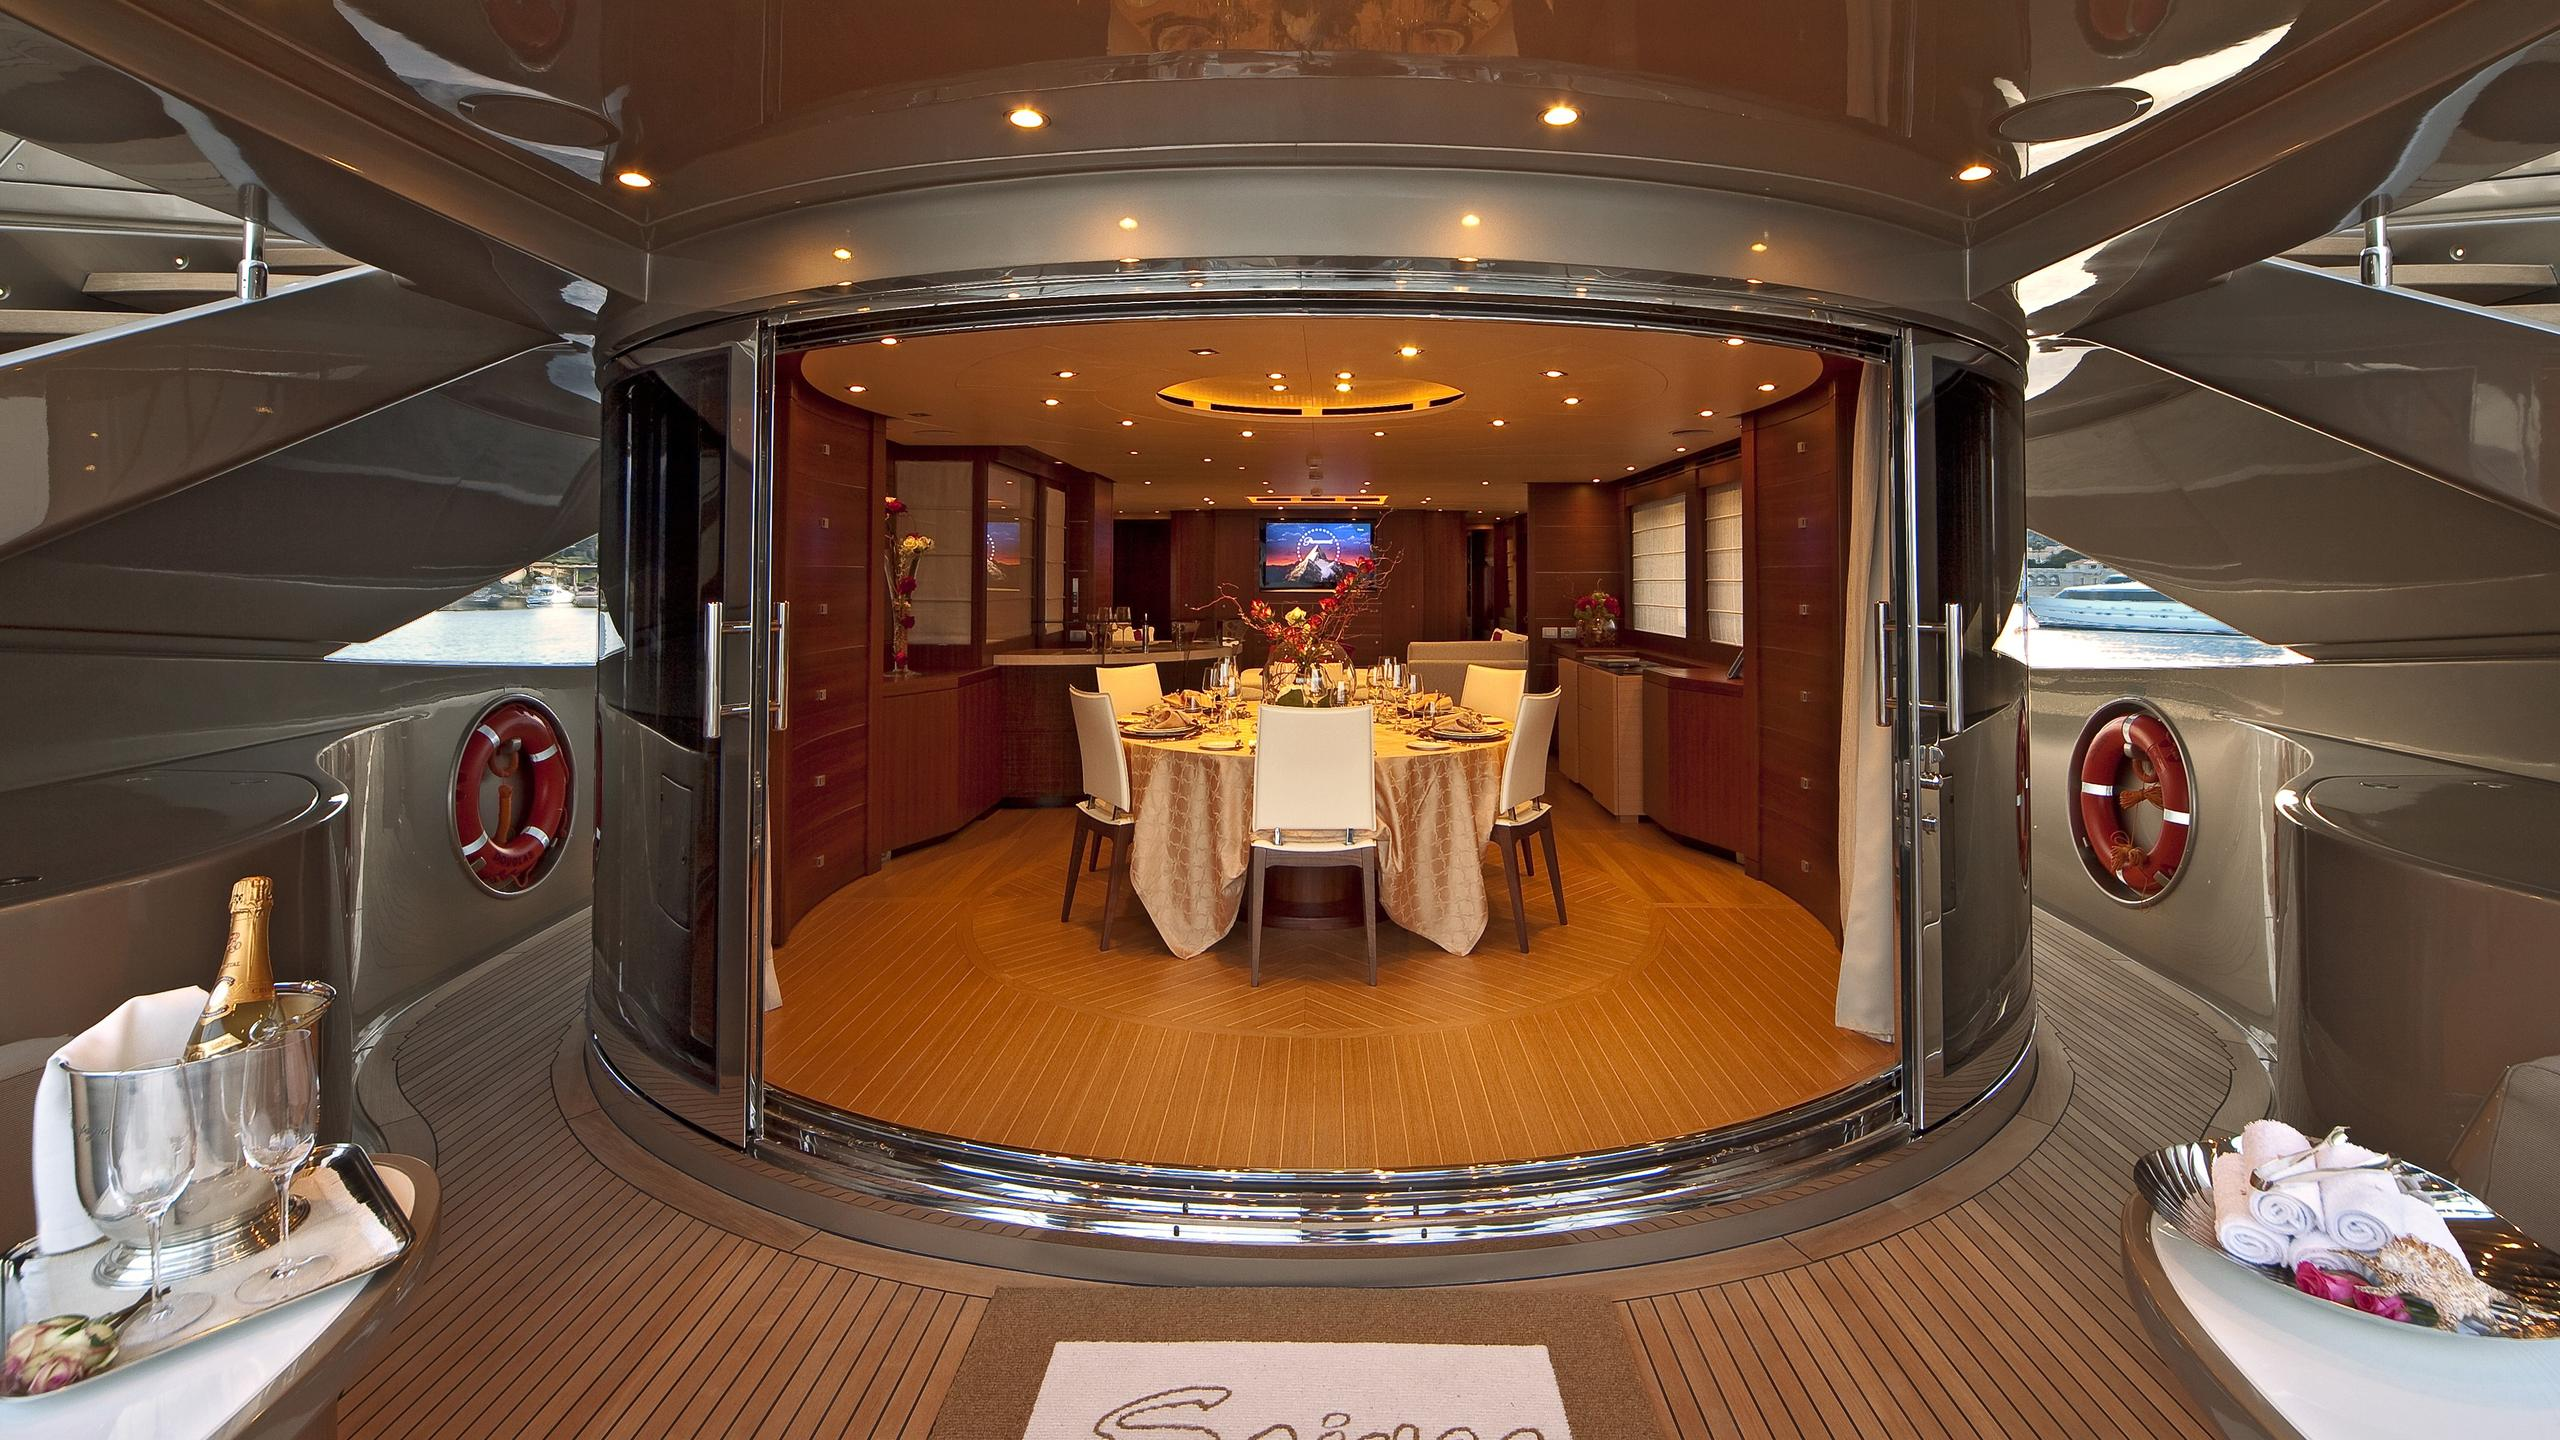 Soiree yacht main deck aft